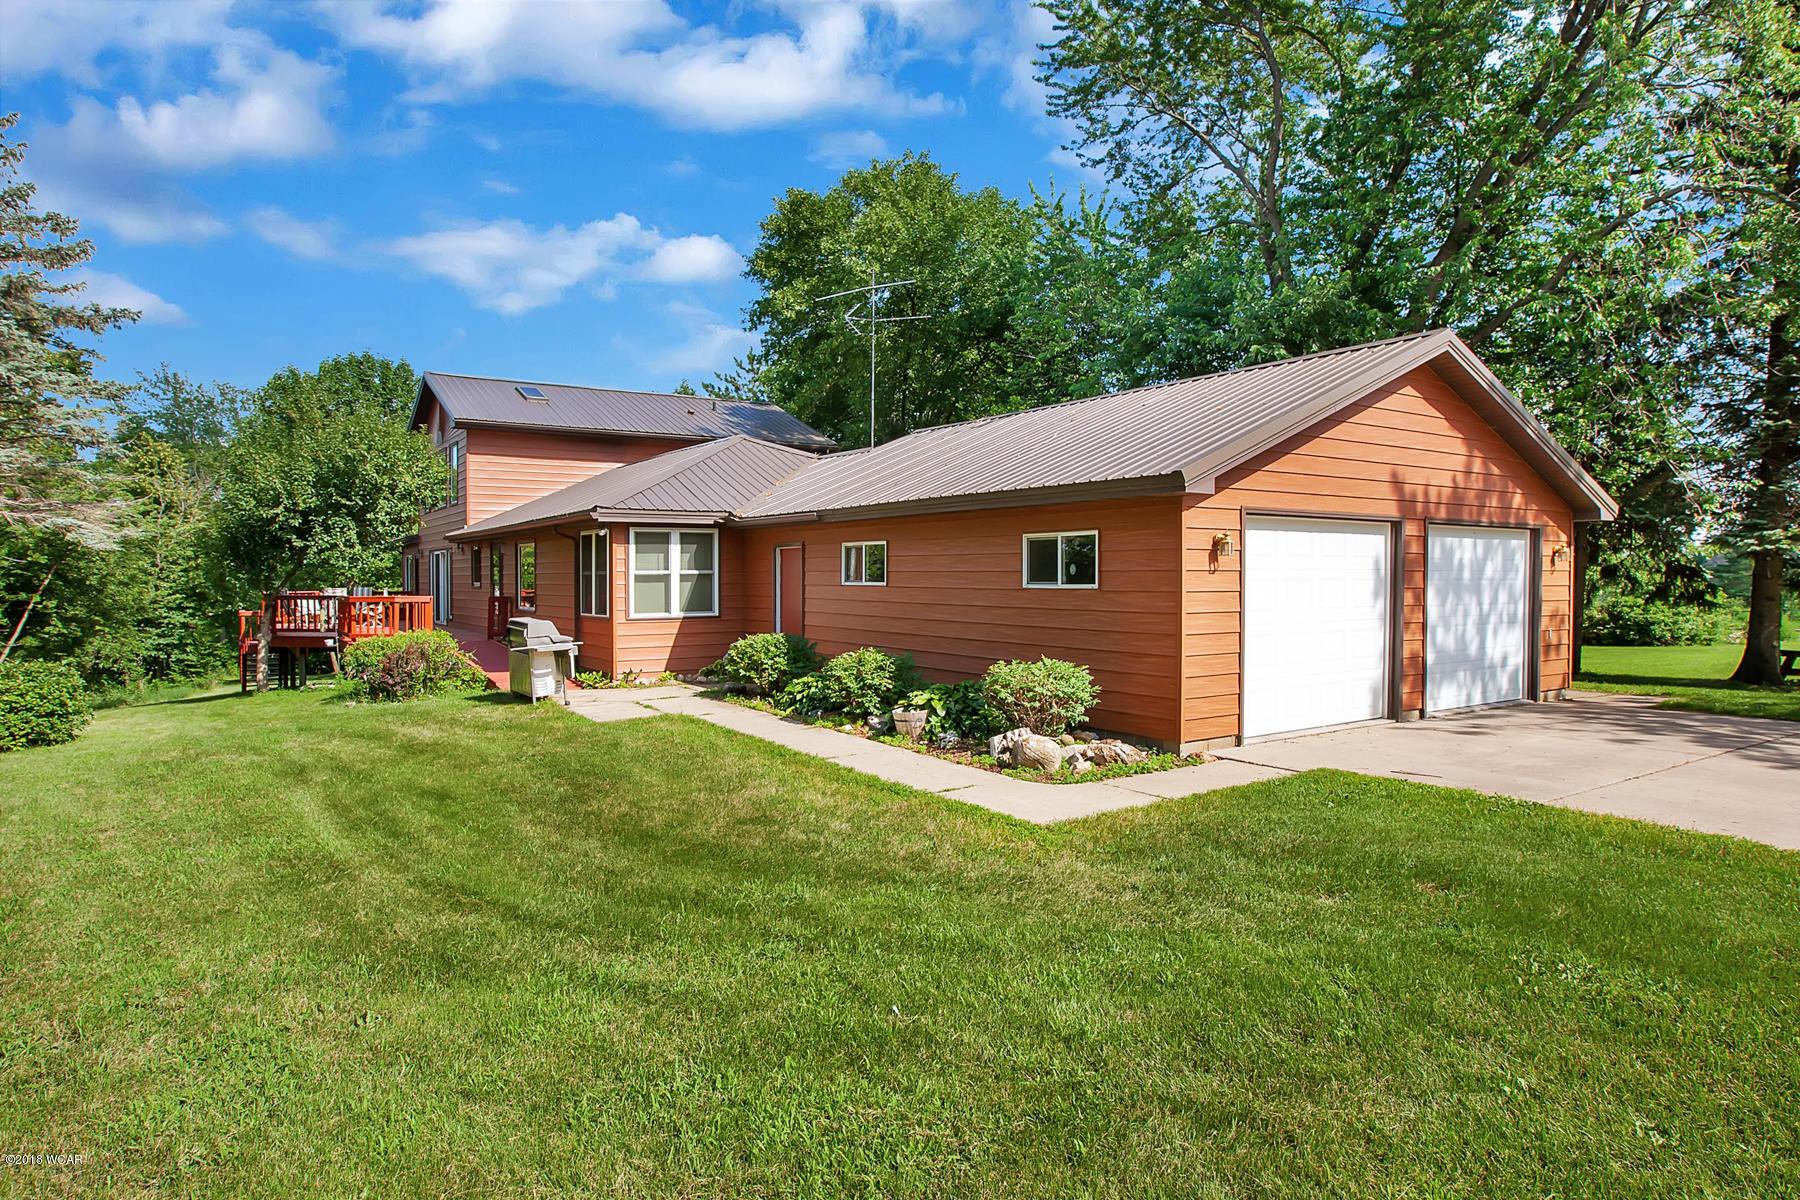 18034 State Highway 22,Richmond,3 Bedrooms Bedrooms,3 BathroomsBathrooms,Single Family,State Highway 22,6031537